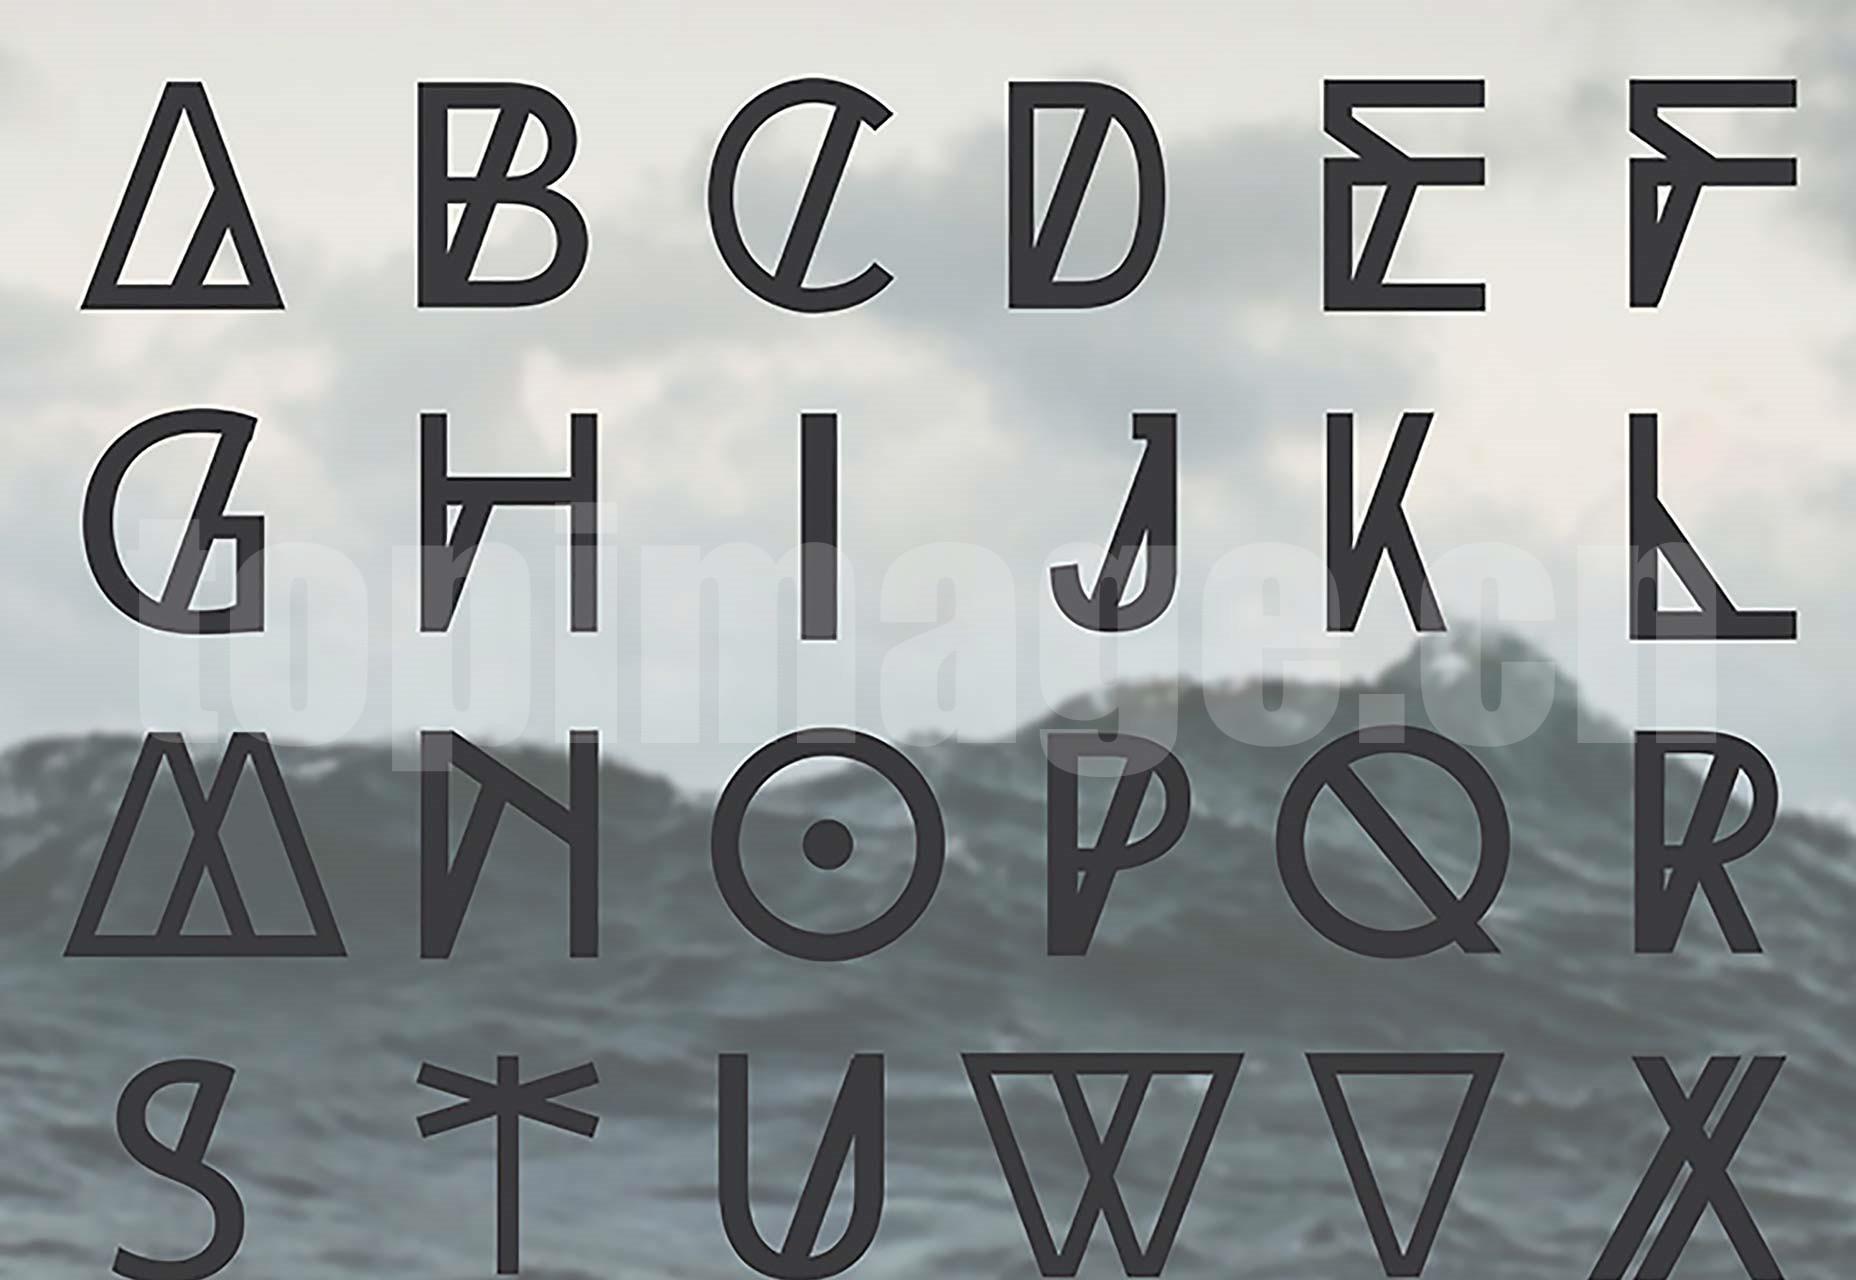 HighTide 创意海报 经典优雅 logo英文字体下载